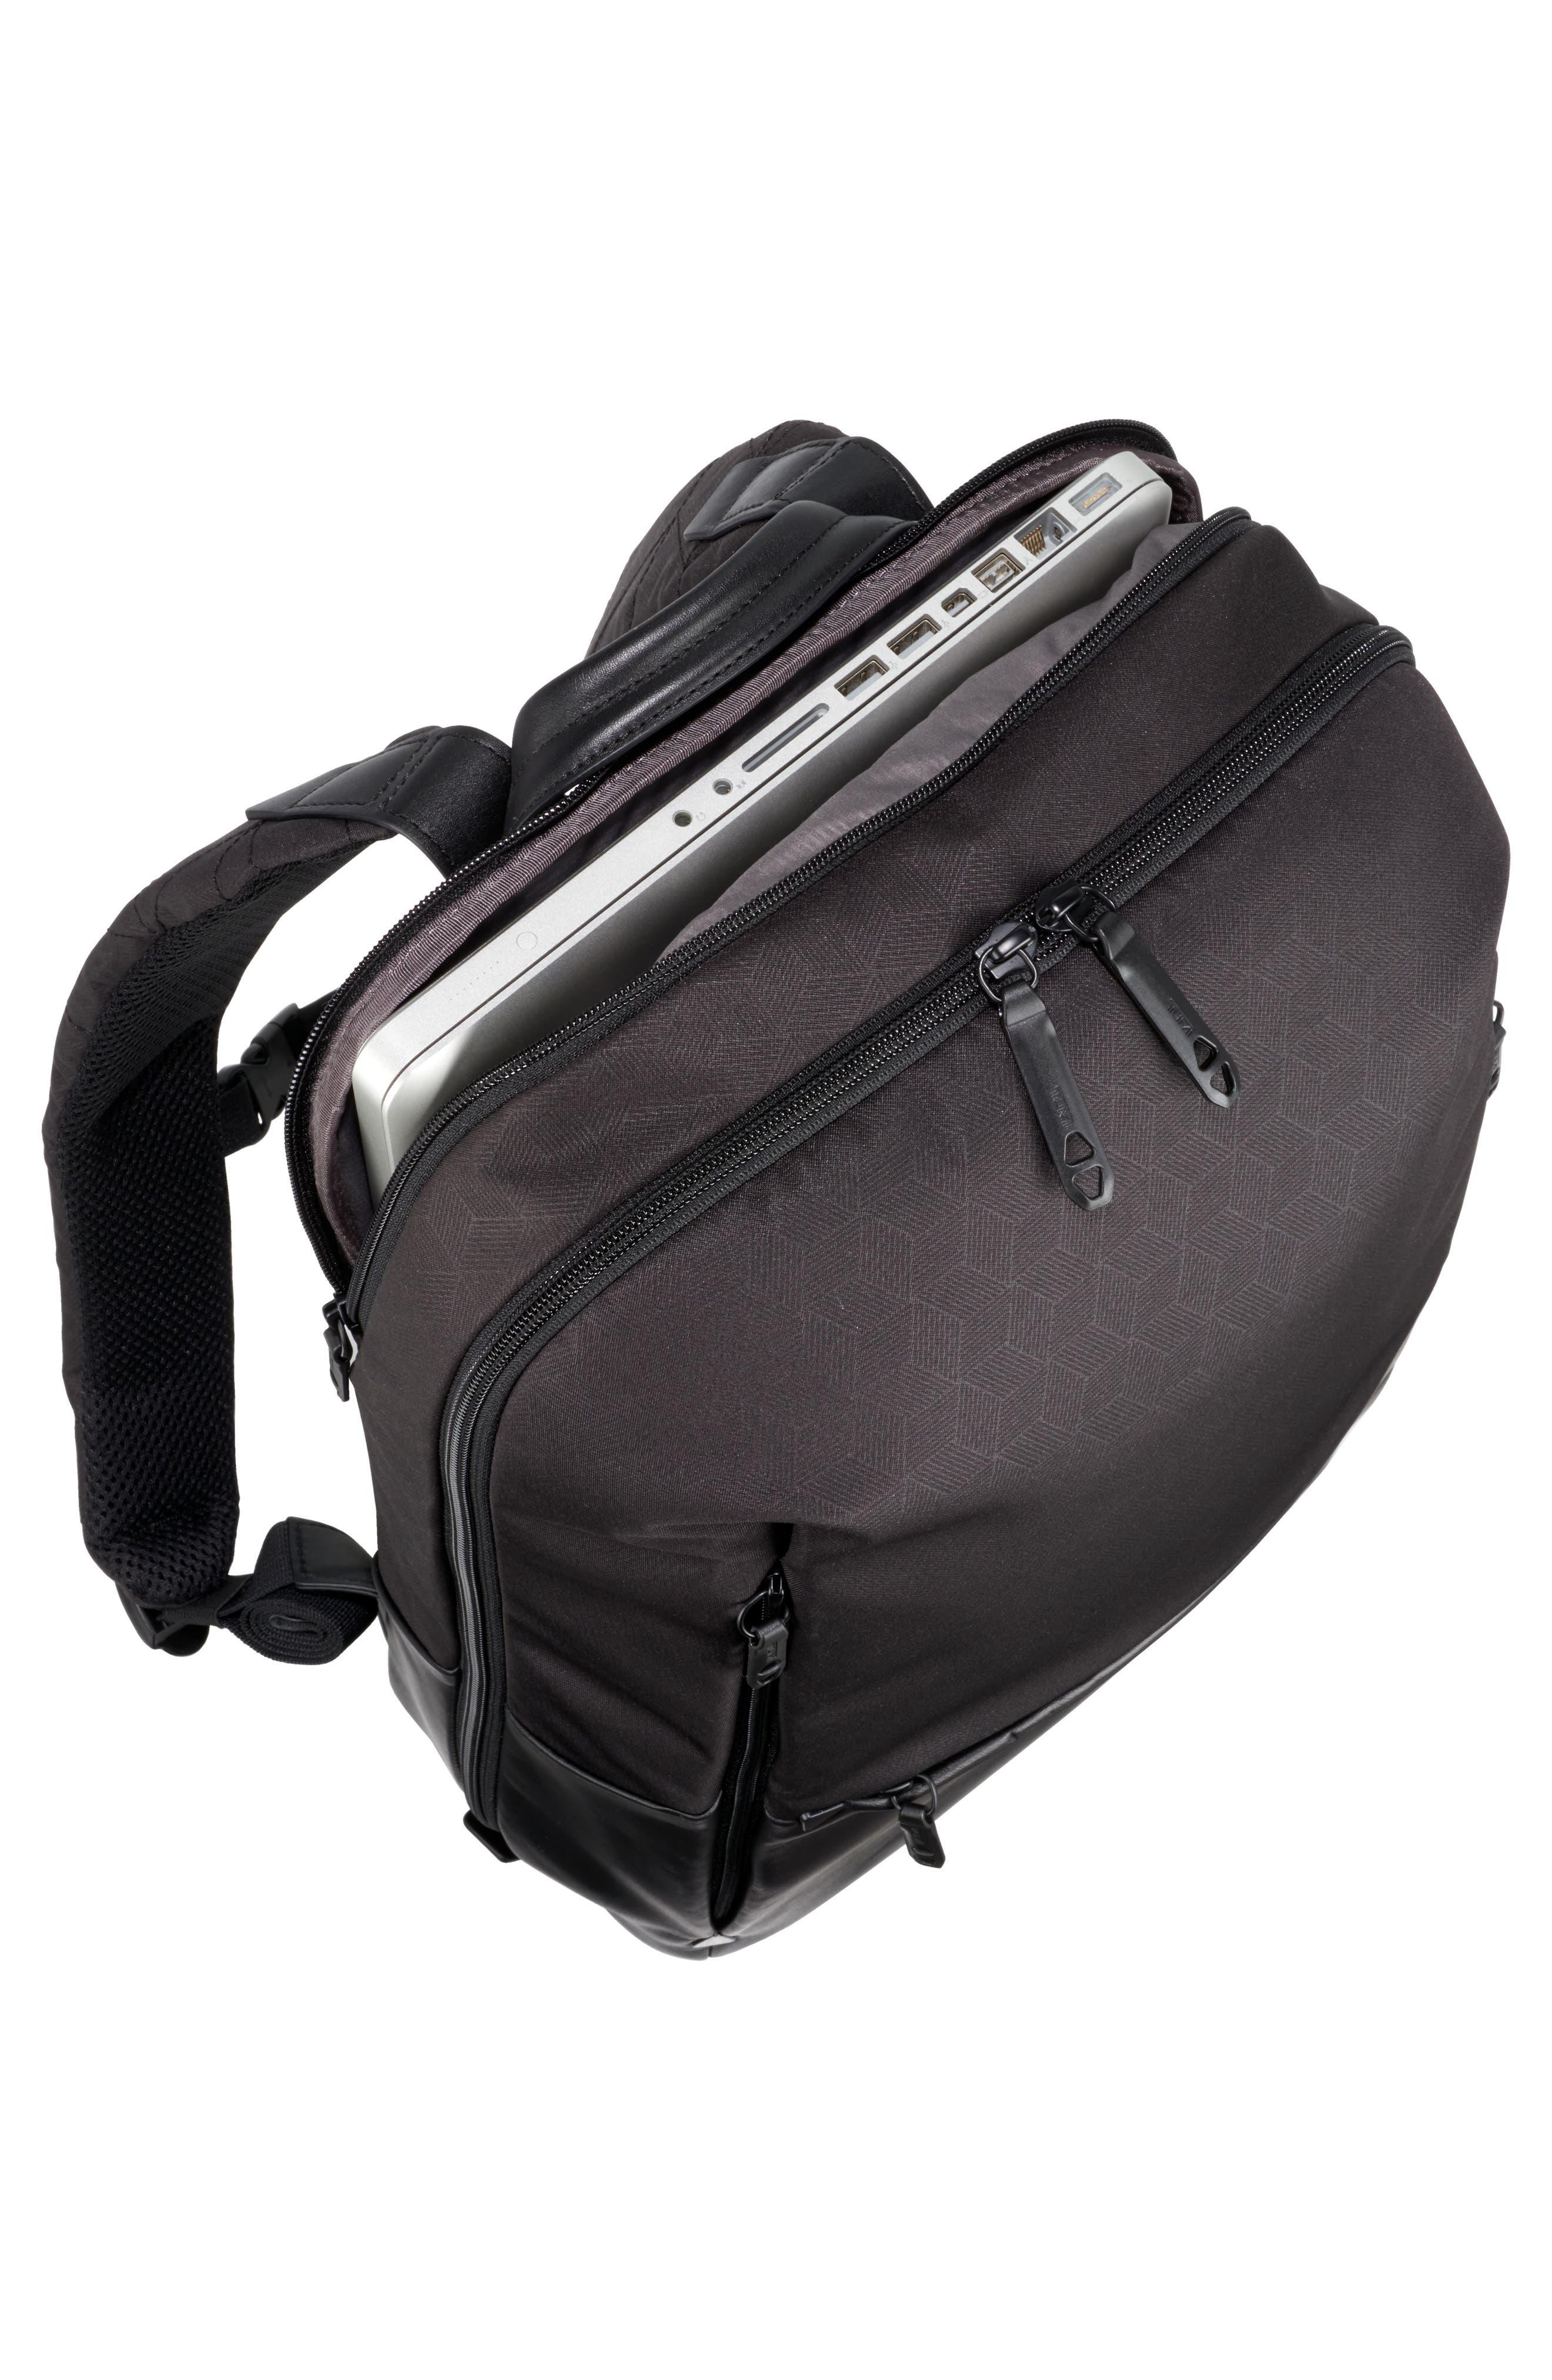 Butler Backpack,                             Alternate thumbnail 4, color,                             Black